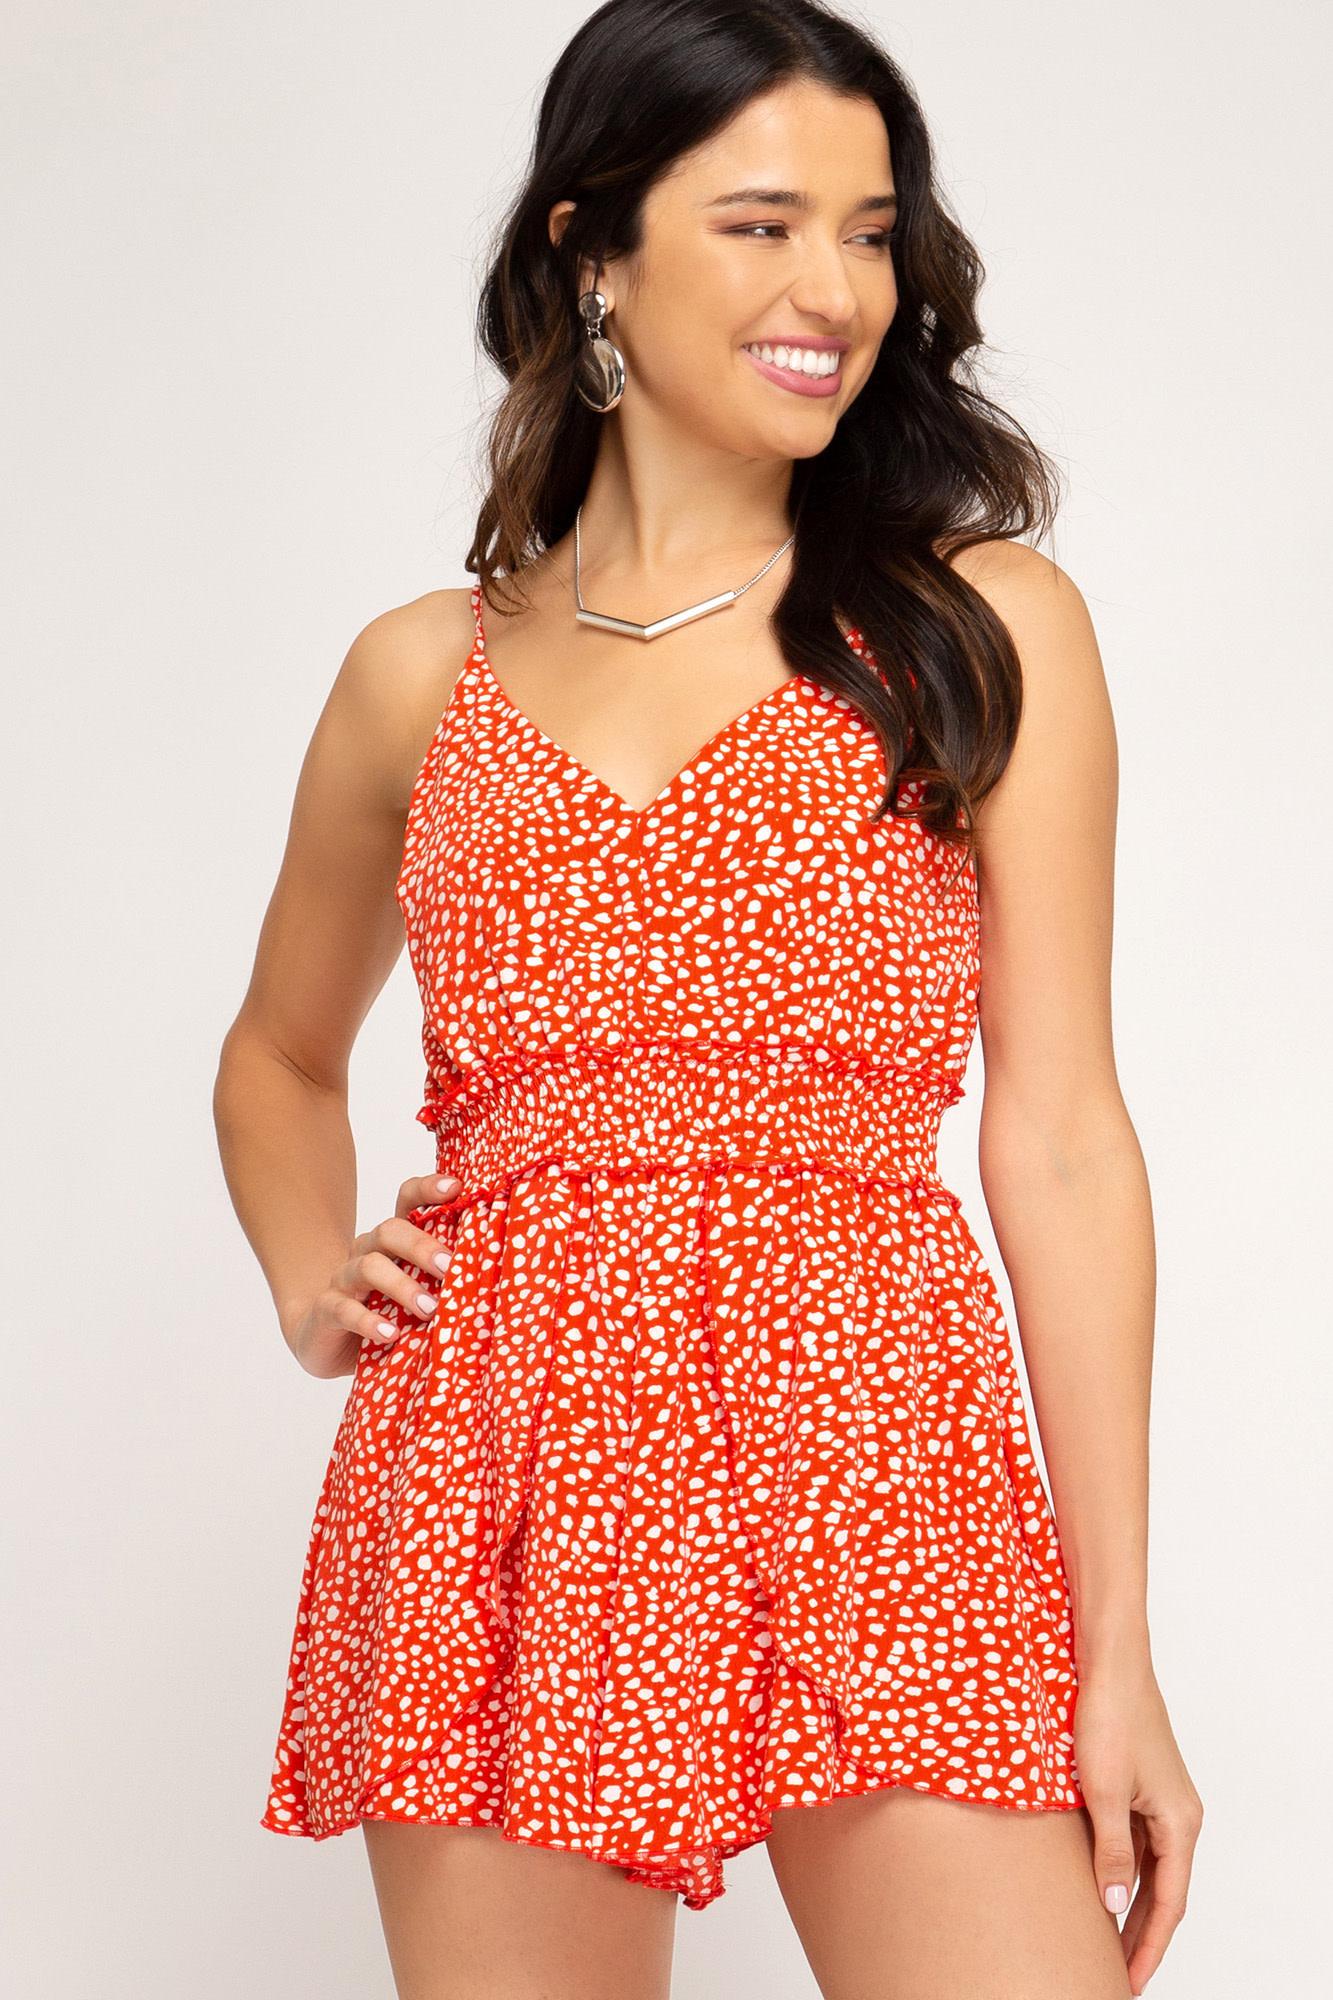 Red & white print sleeveless romper w/smocked waist